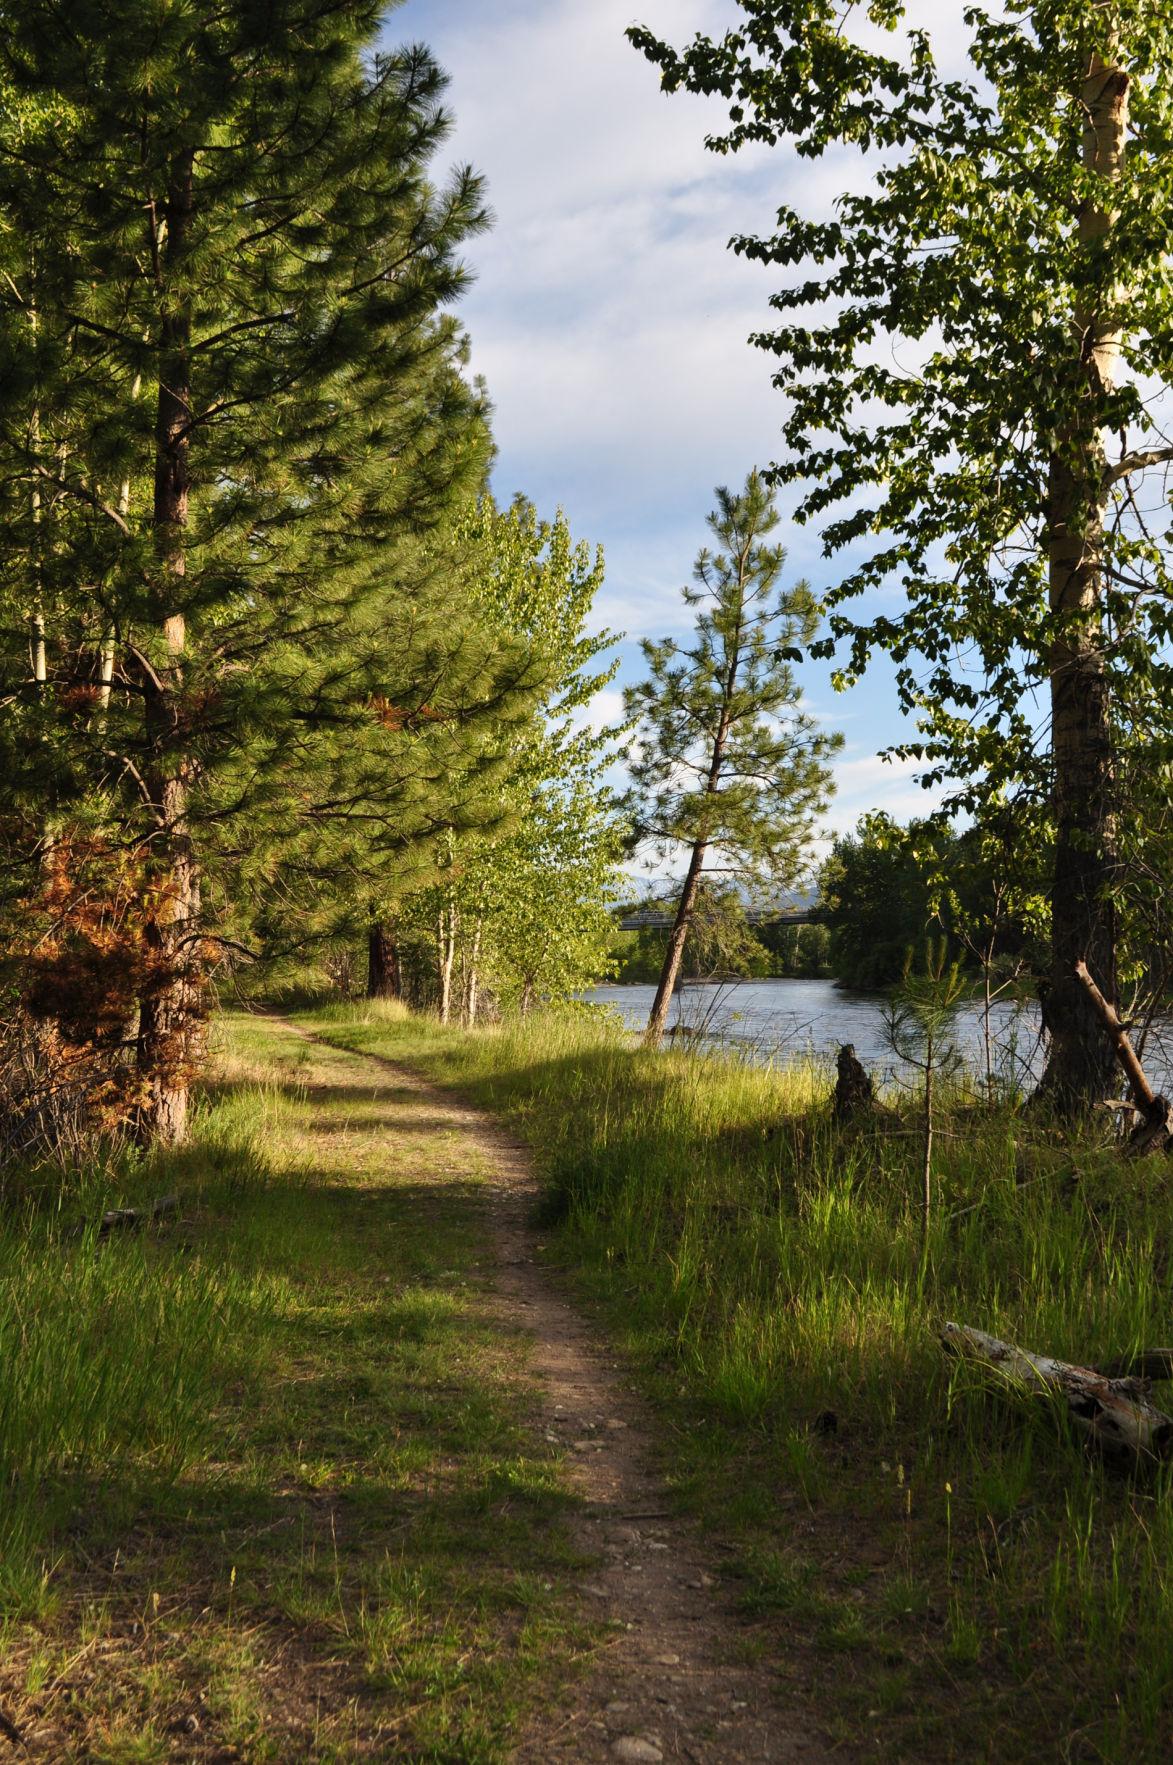 Land Trust, city reach deal on park land along river